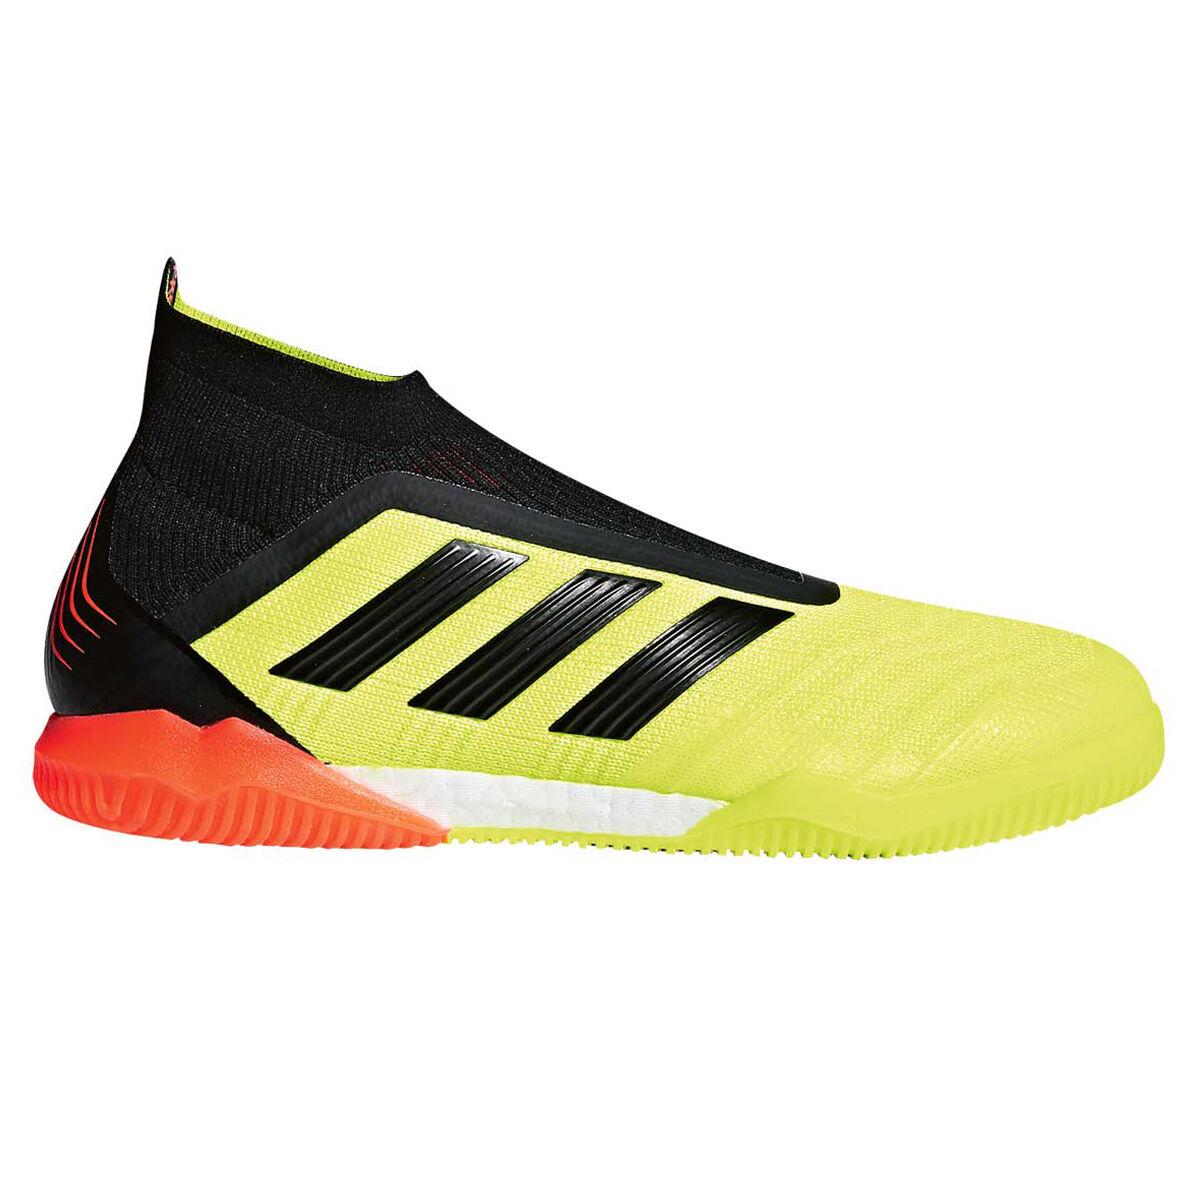 Look - Predator Adidas indoor soccer shoes video